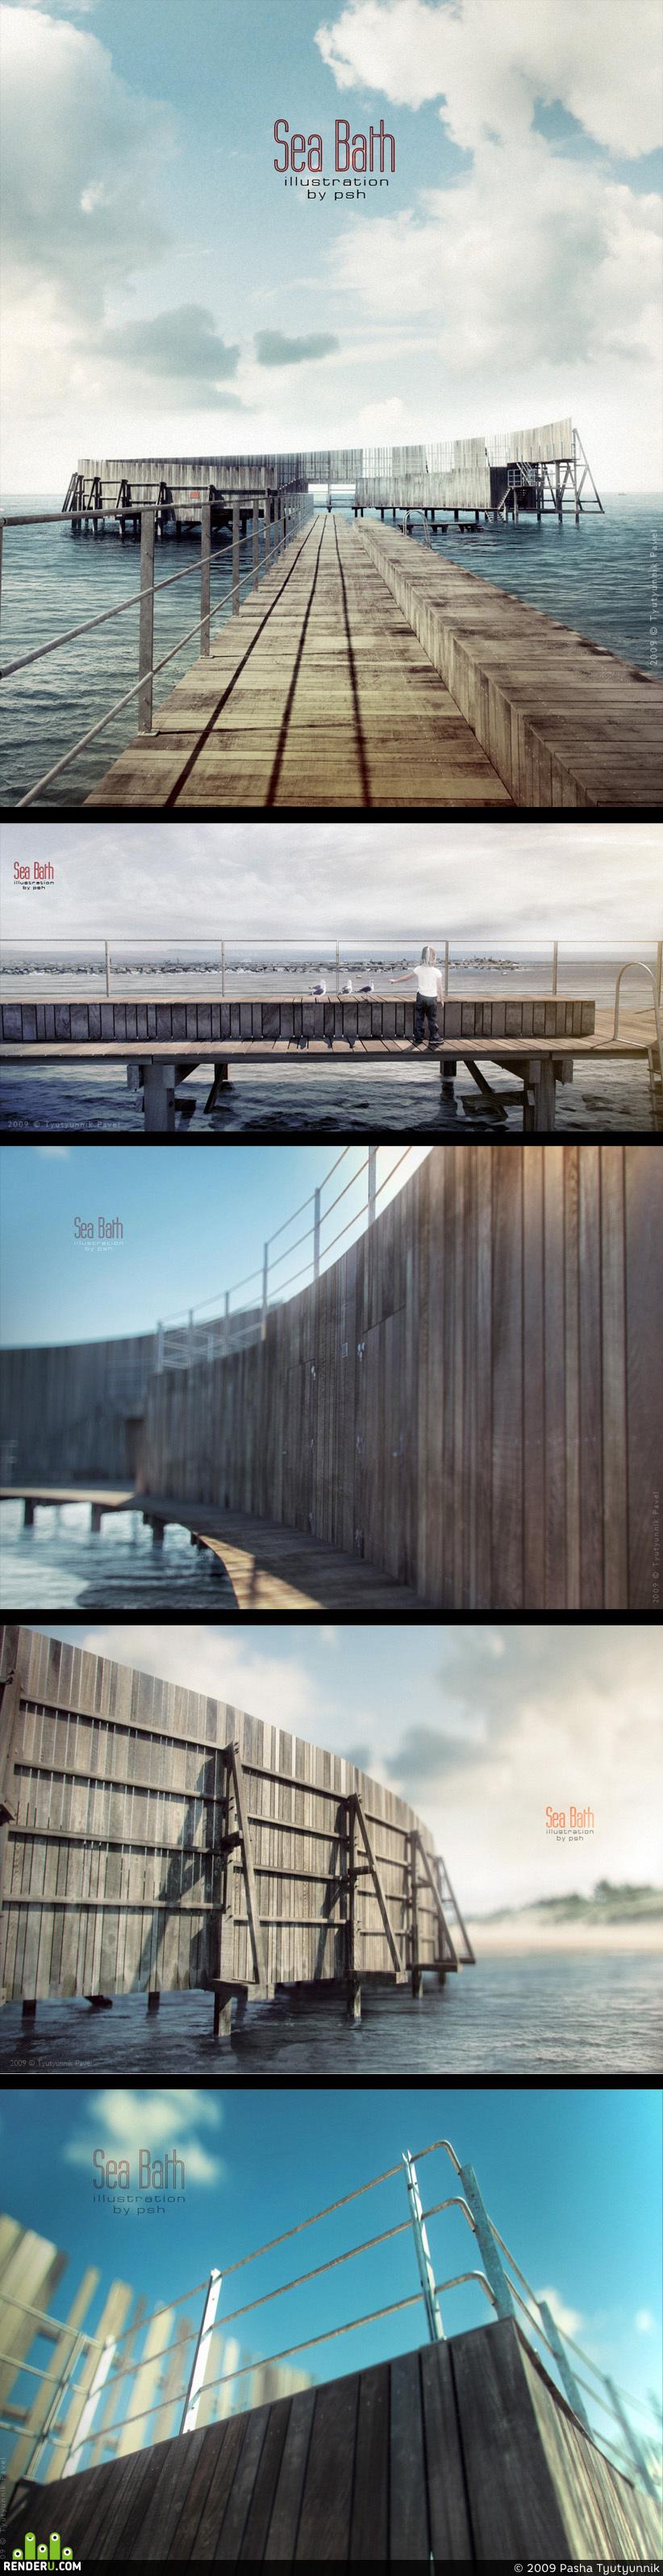 preview Kastrup Sea Bath